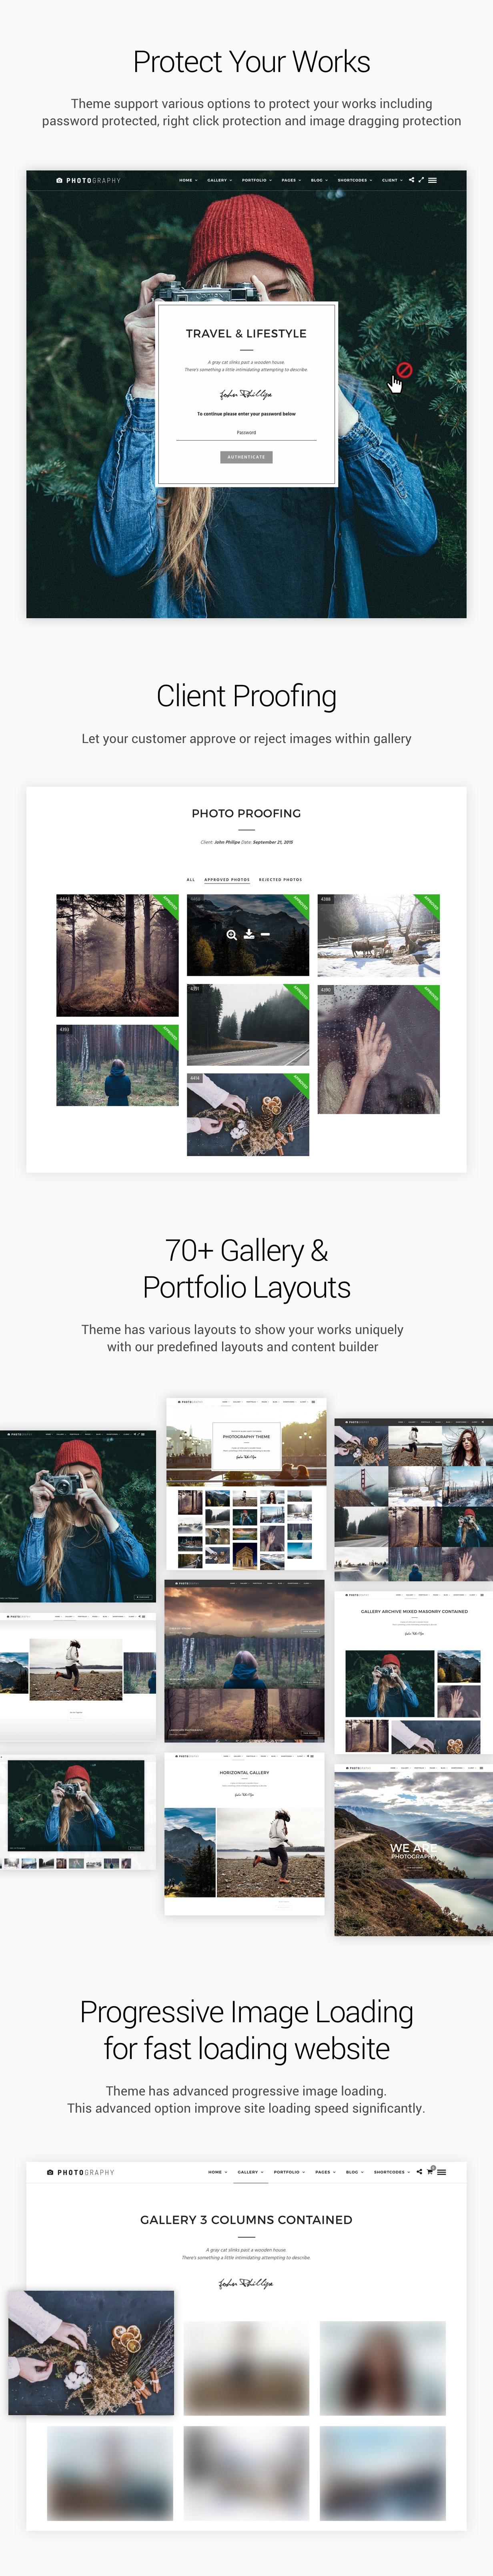 piece4 - Photography WordPress